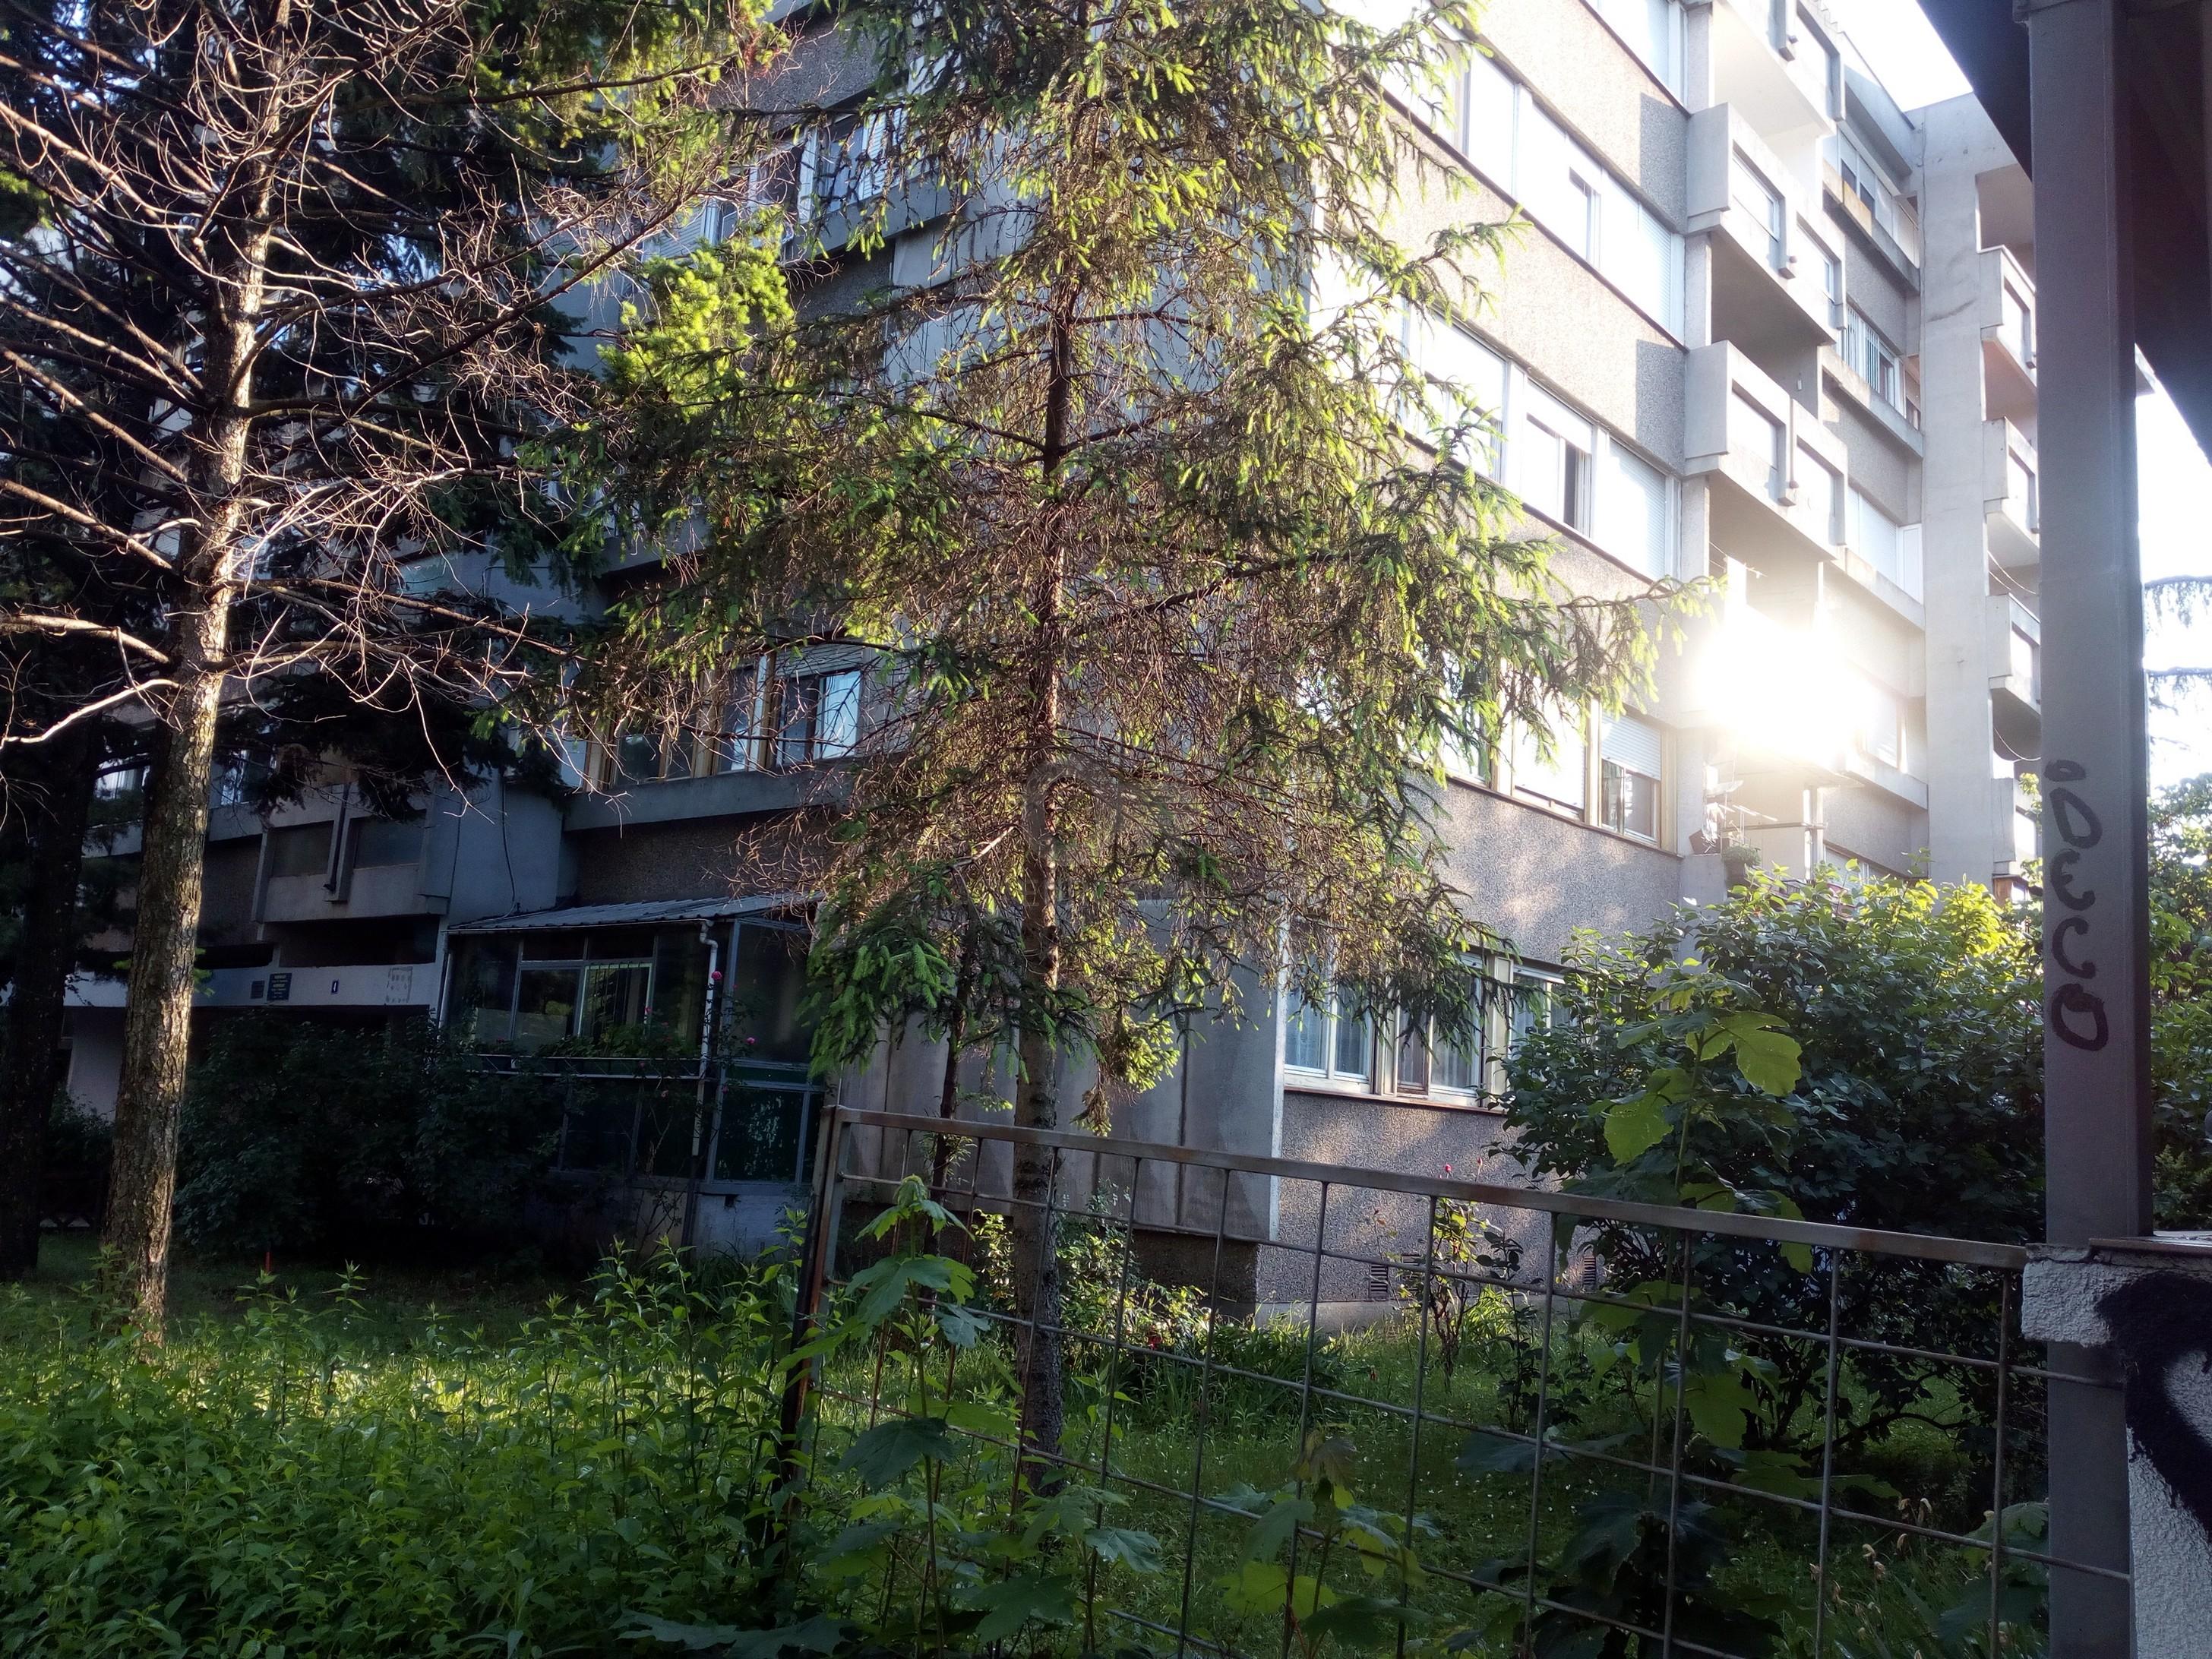 Stan HOTEL JUGOSLAVIJA 133000 EUR